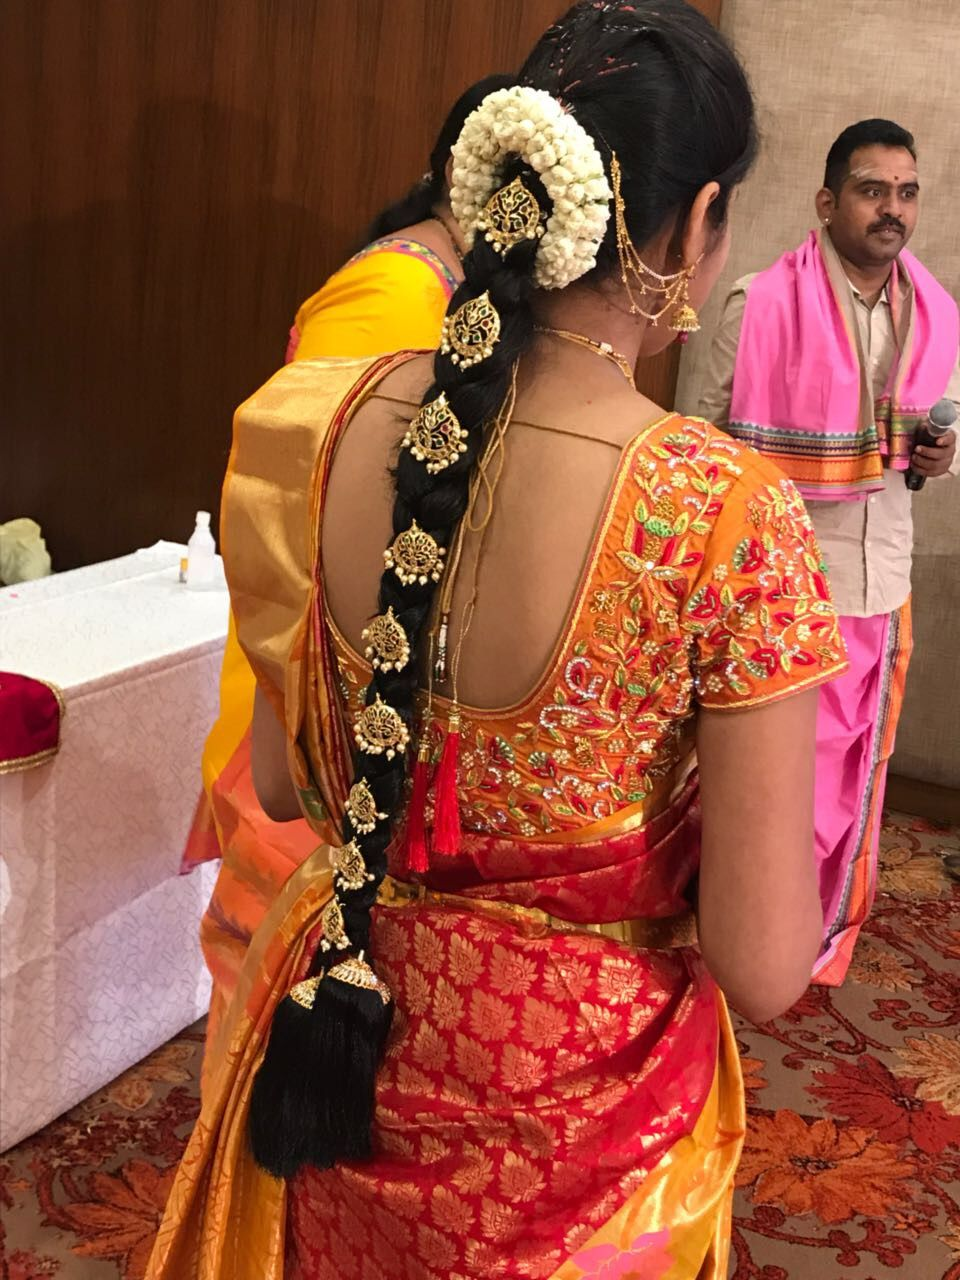 pin by swathi kommineni on wedding in 2019 | indian wedding